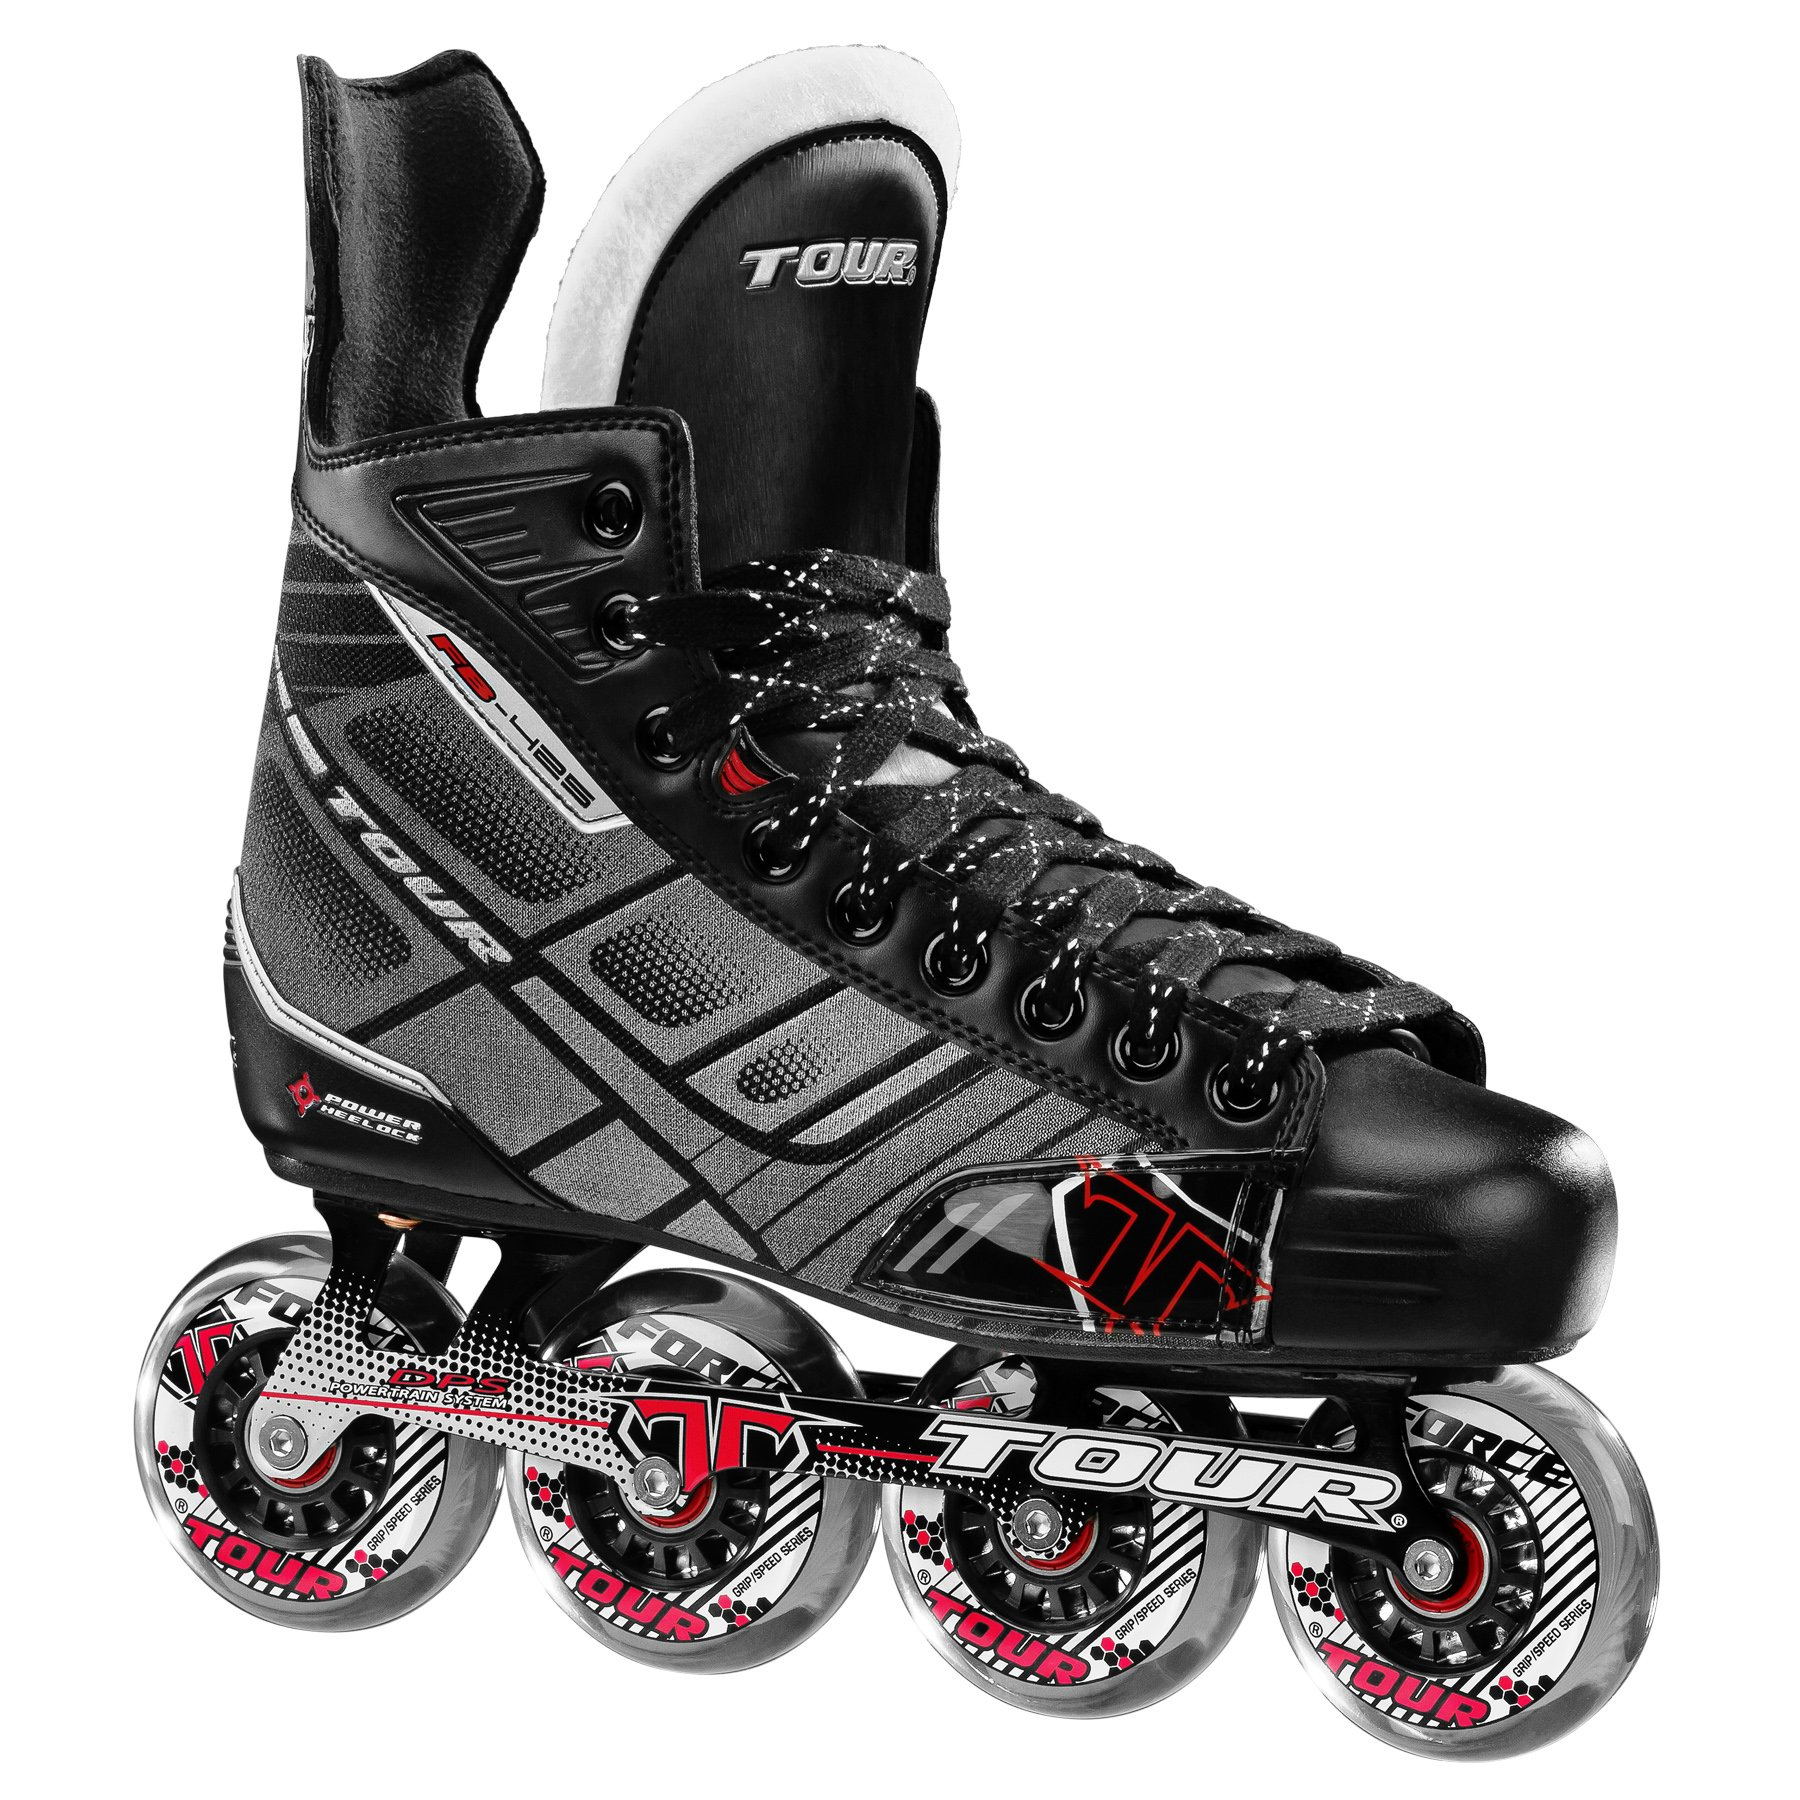 Tour Hockey 63TA-03 BONELITE 425 Inline Hockey Skate